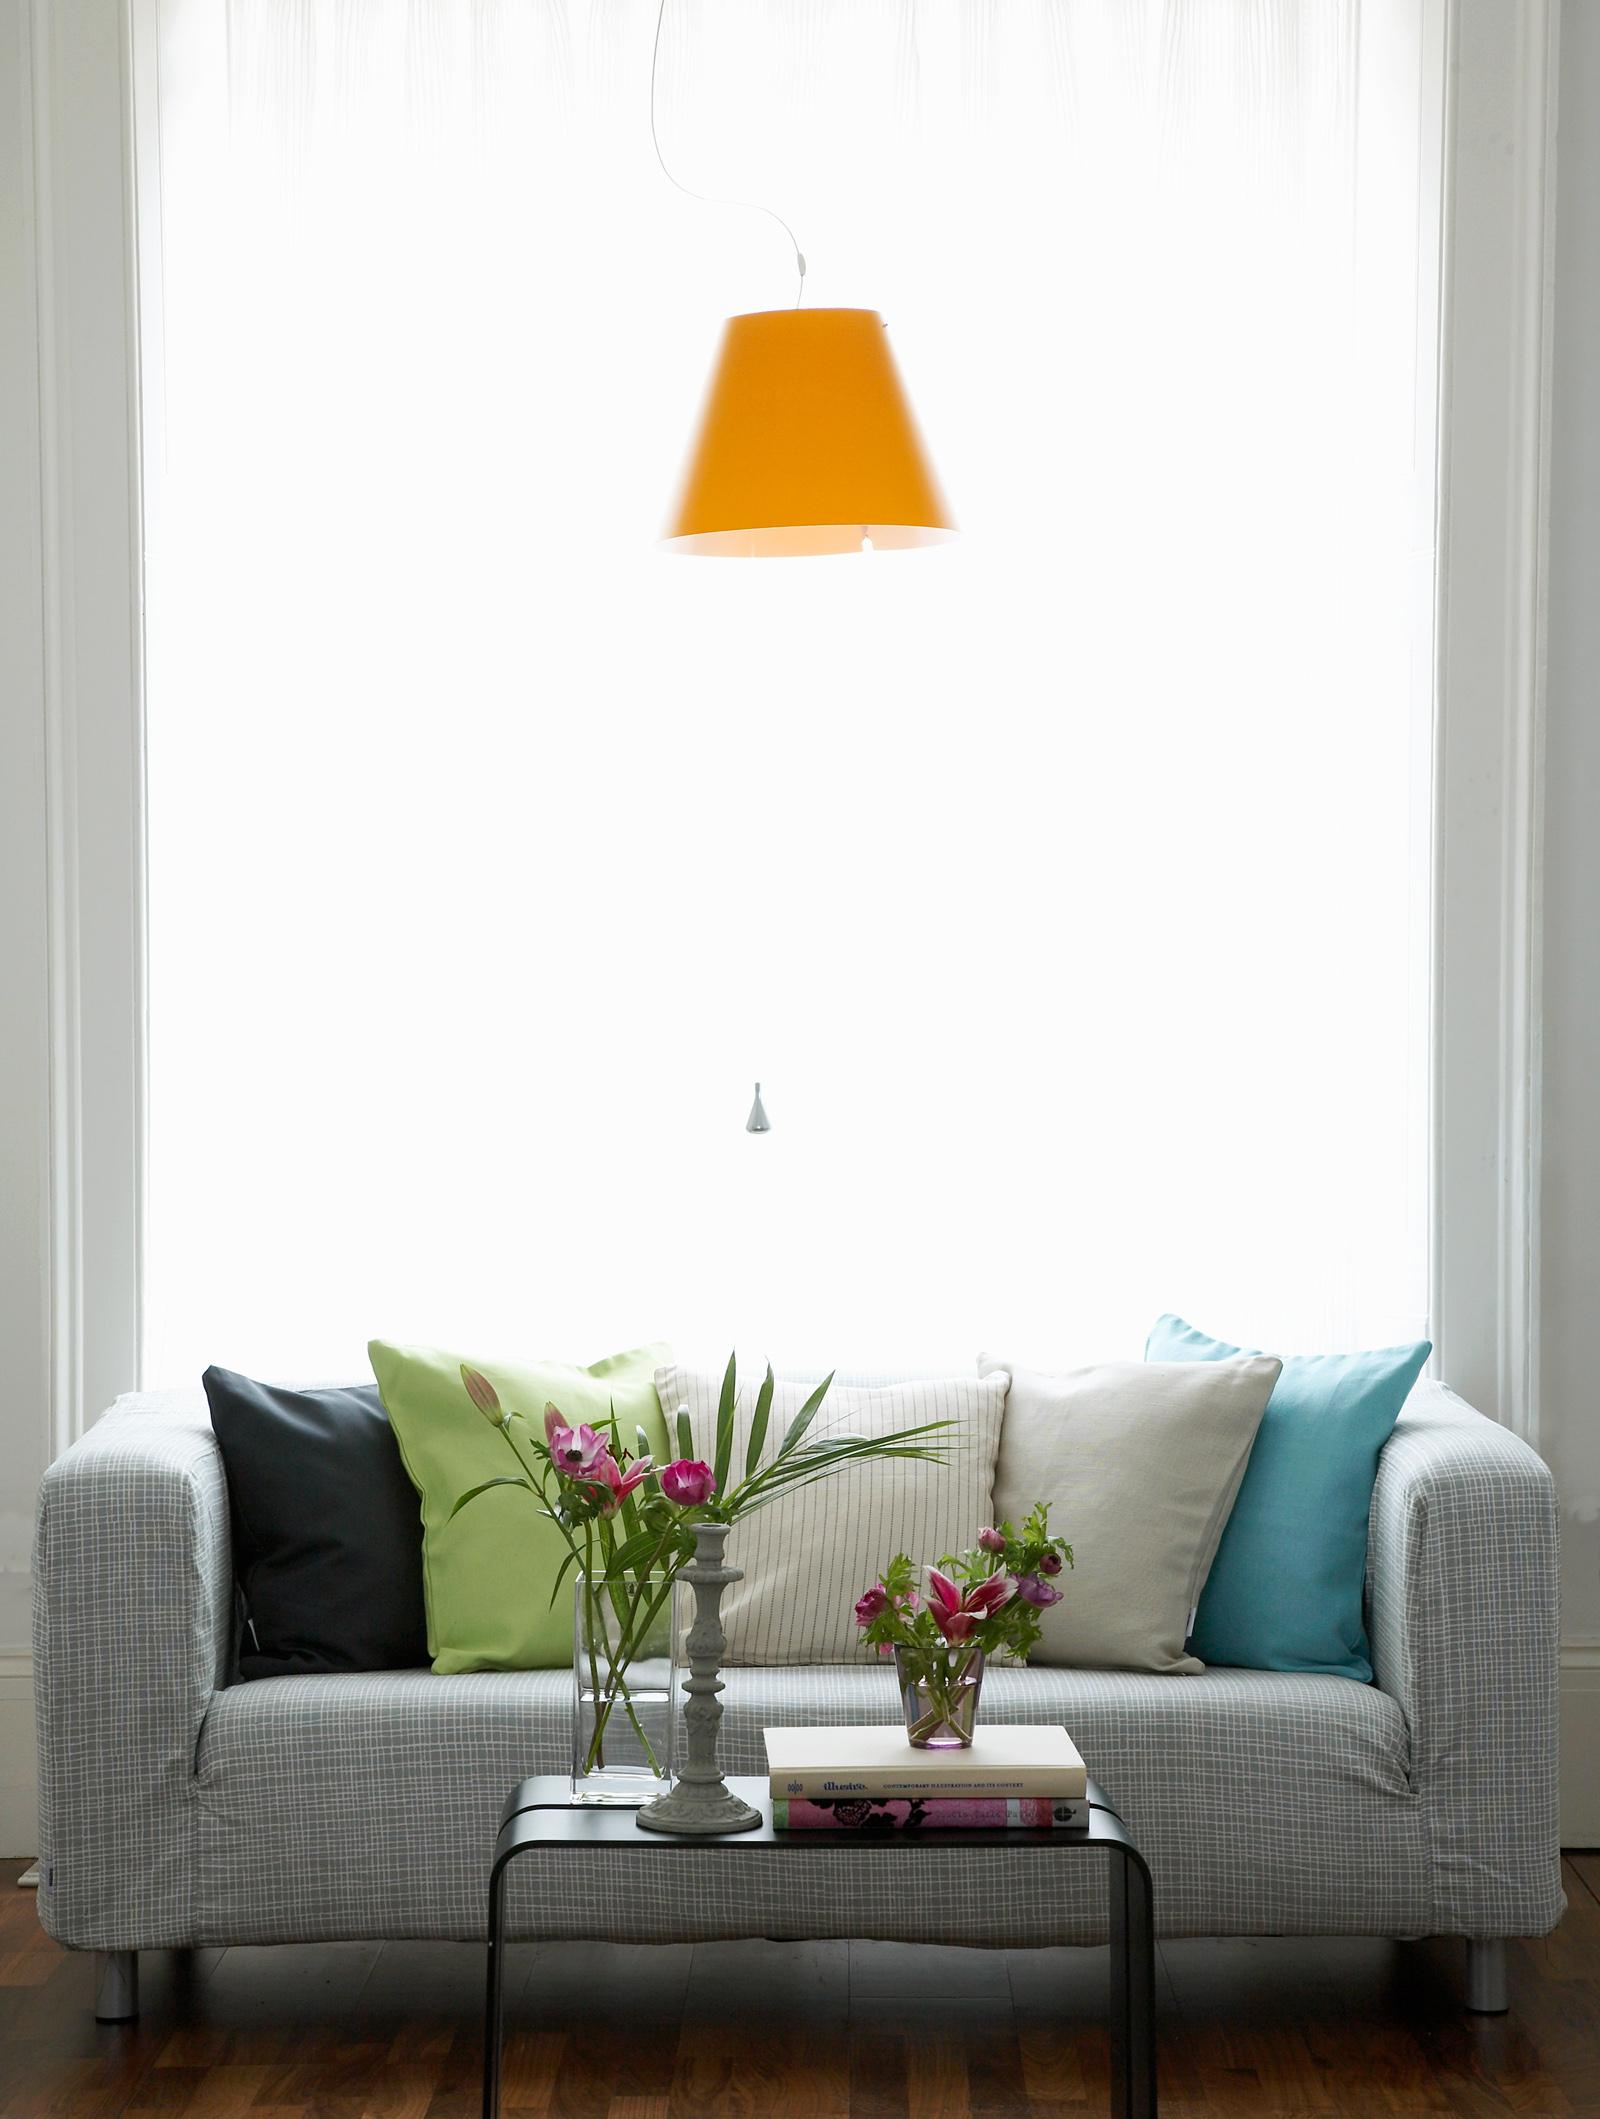 kariertes sofa bilder ideen couchstyle. Black Bedroom Furniture Sets. Home Design Ideas